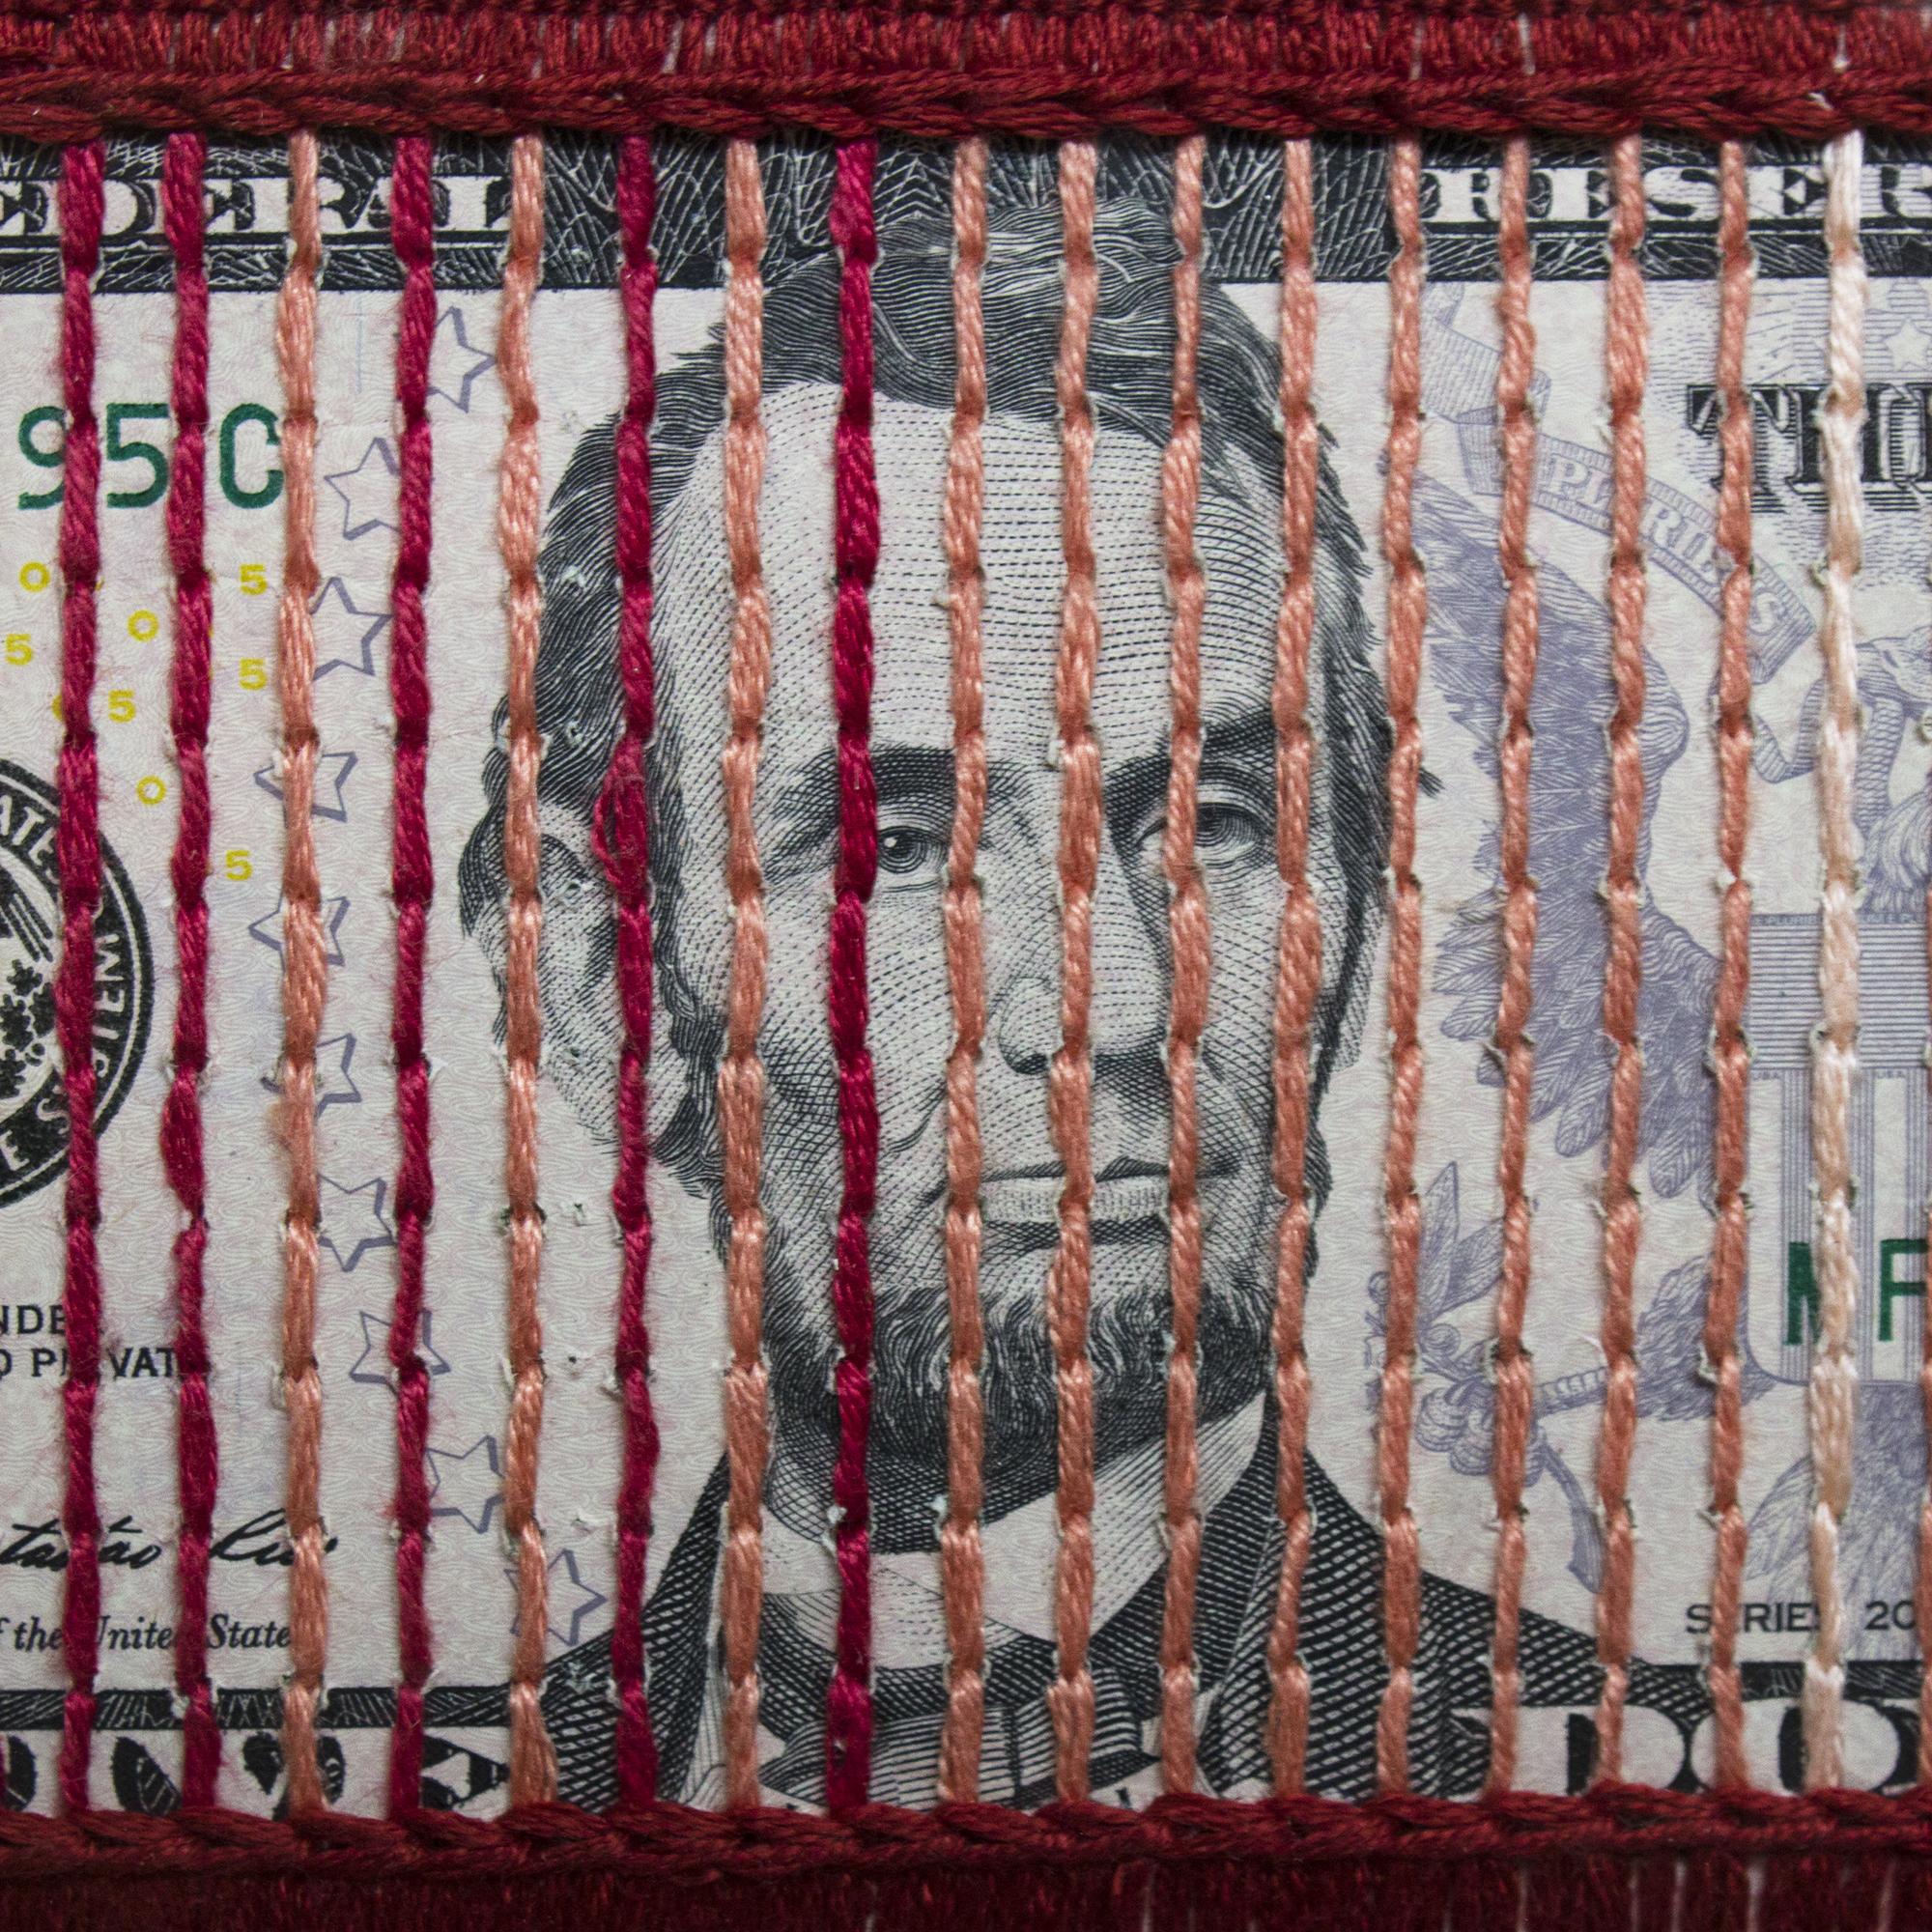 Embroidered Bills